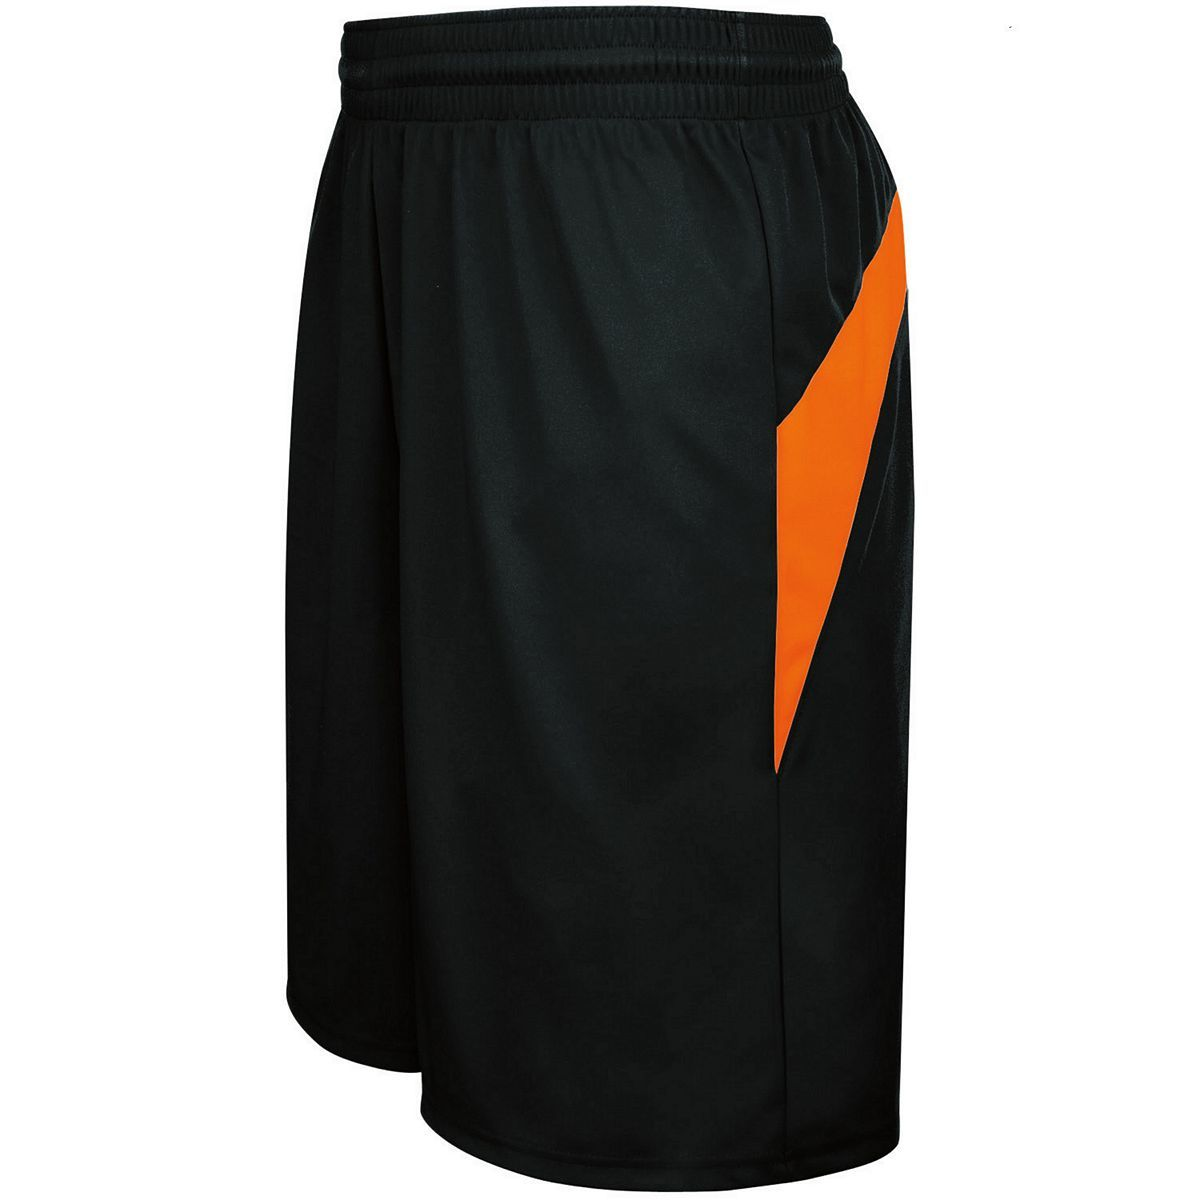 Adult Transition Game Shorts - BLACK/ORANGE